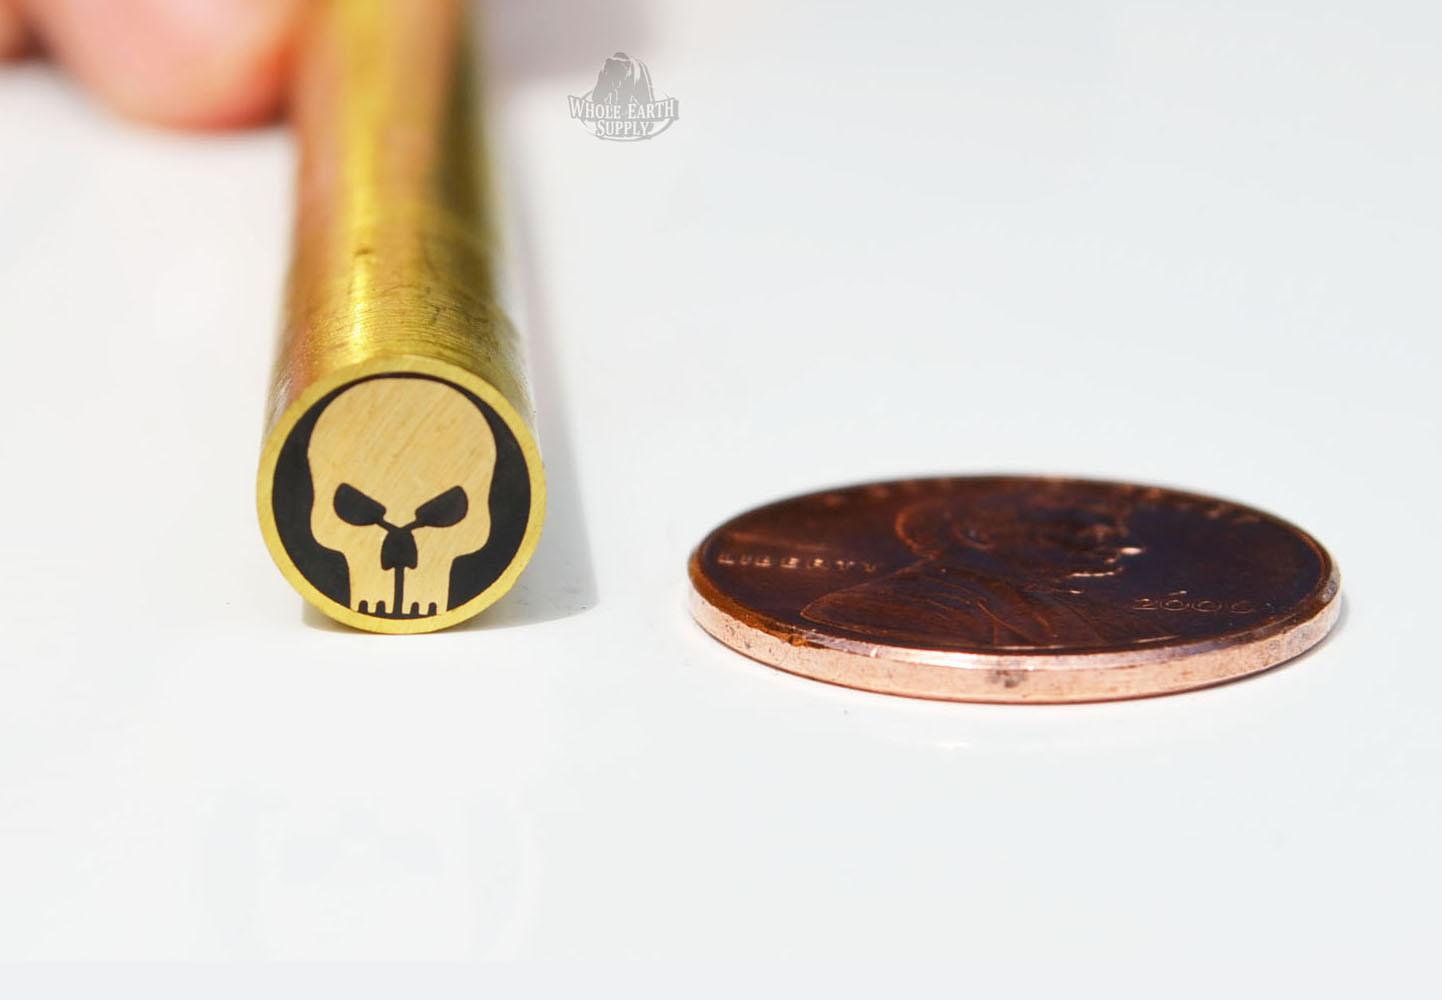 BlanksAndBlades com - Mosaic Pin #217 Skull Black 8mm Brass Knife